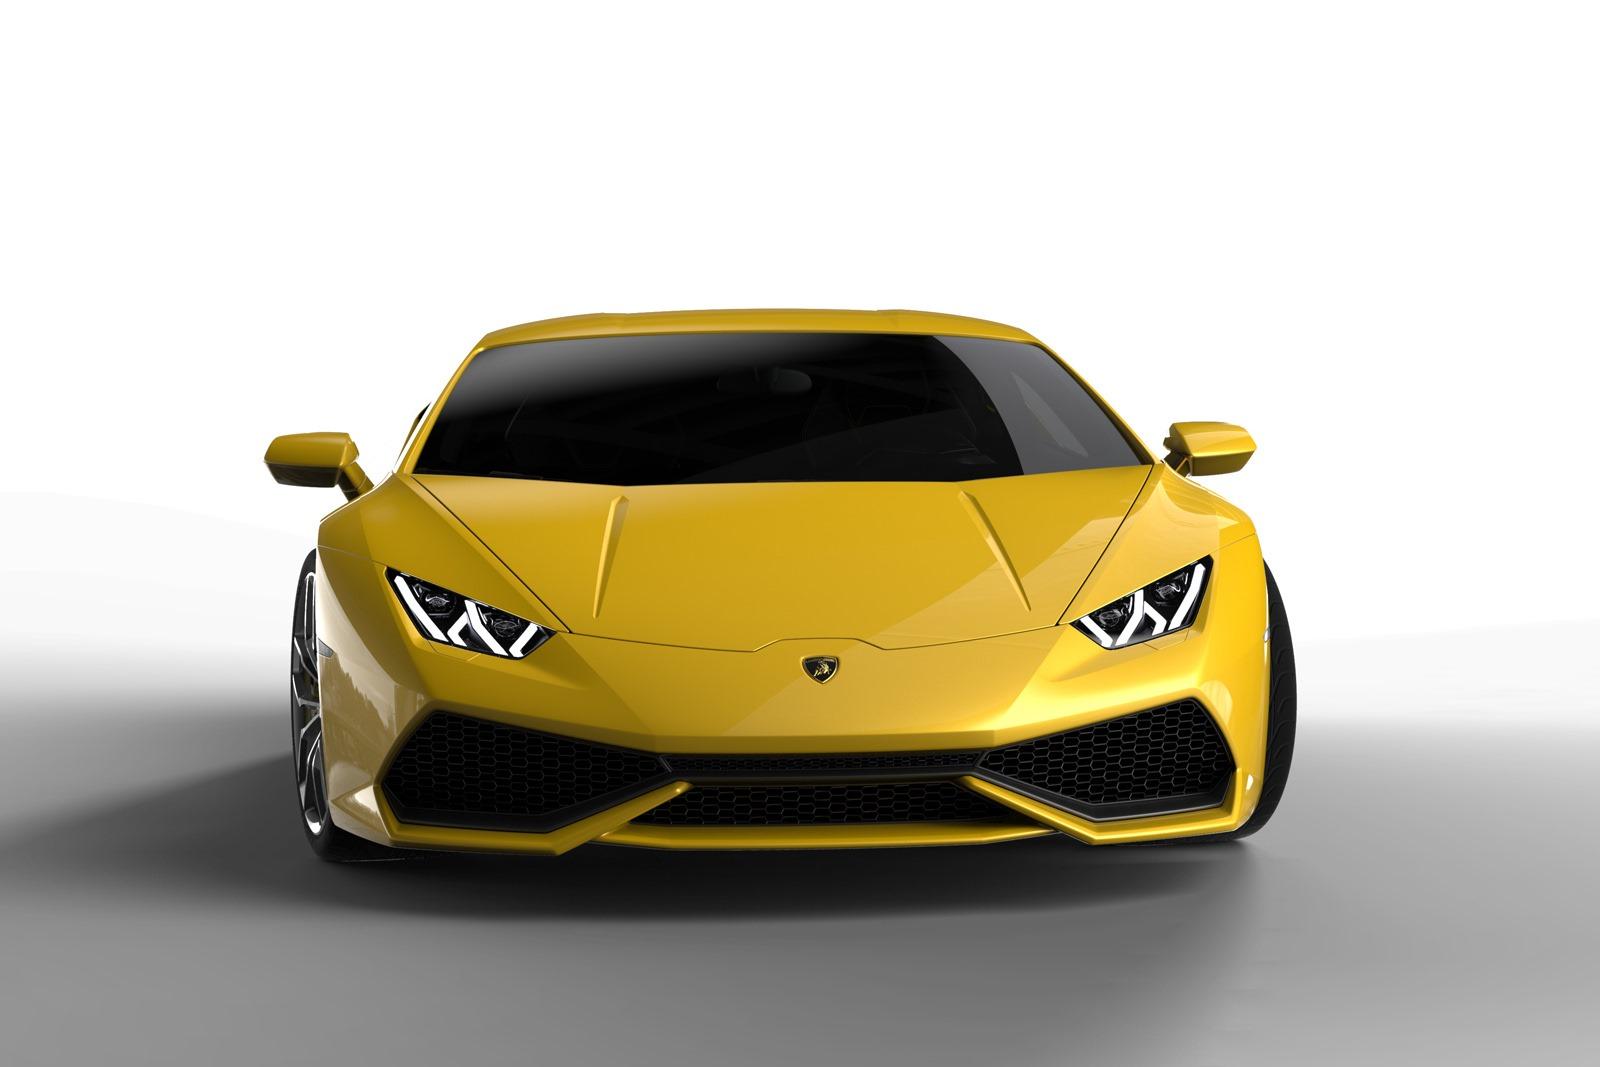 Lamborghini Huracan Picture Gallery